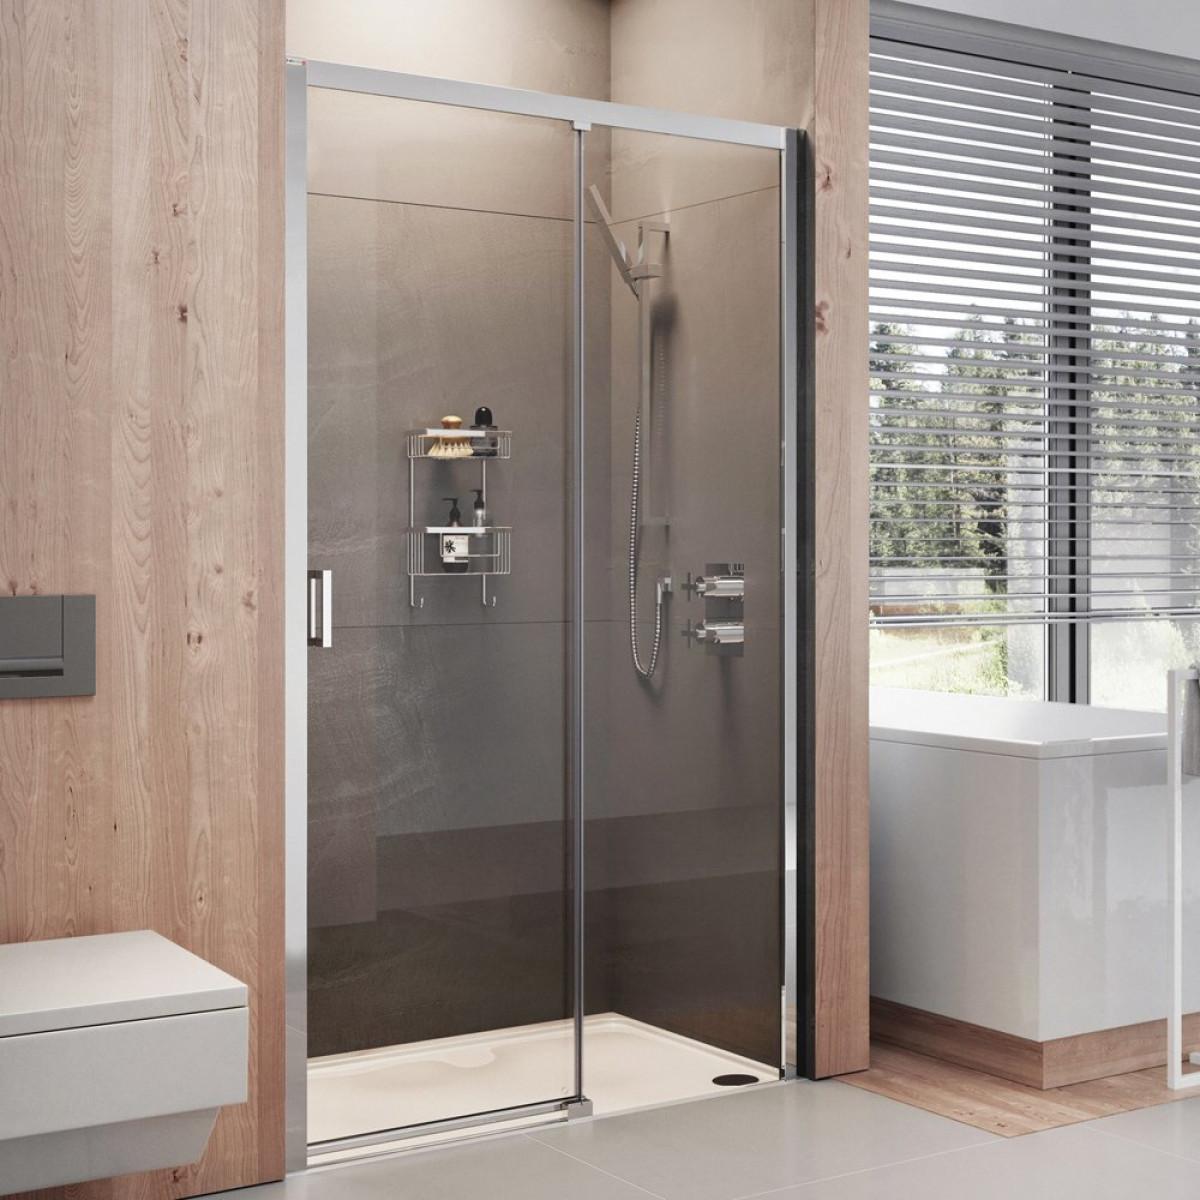 Roman Lumin8 1100mm Level Access Sliding Door Shower